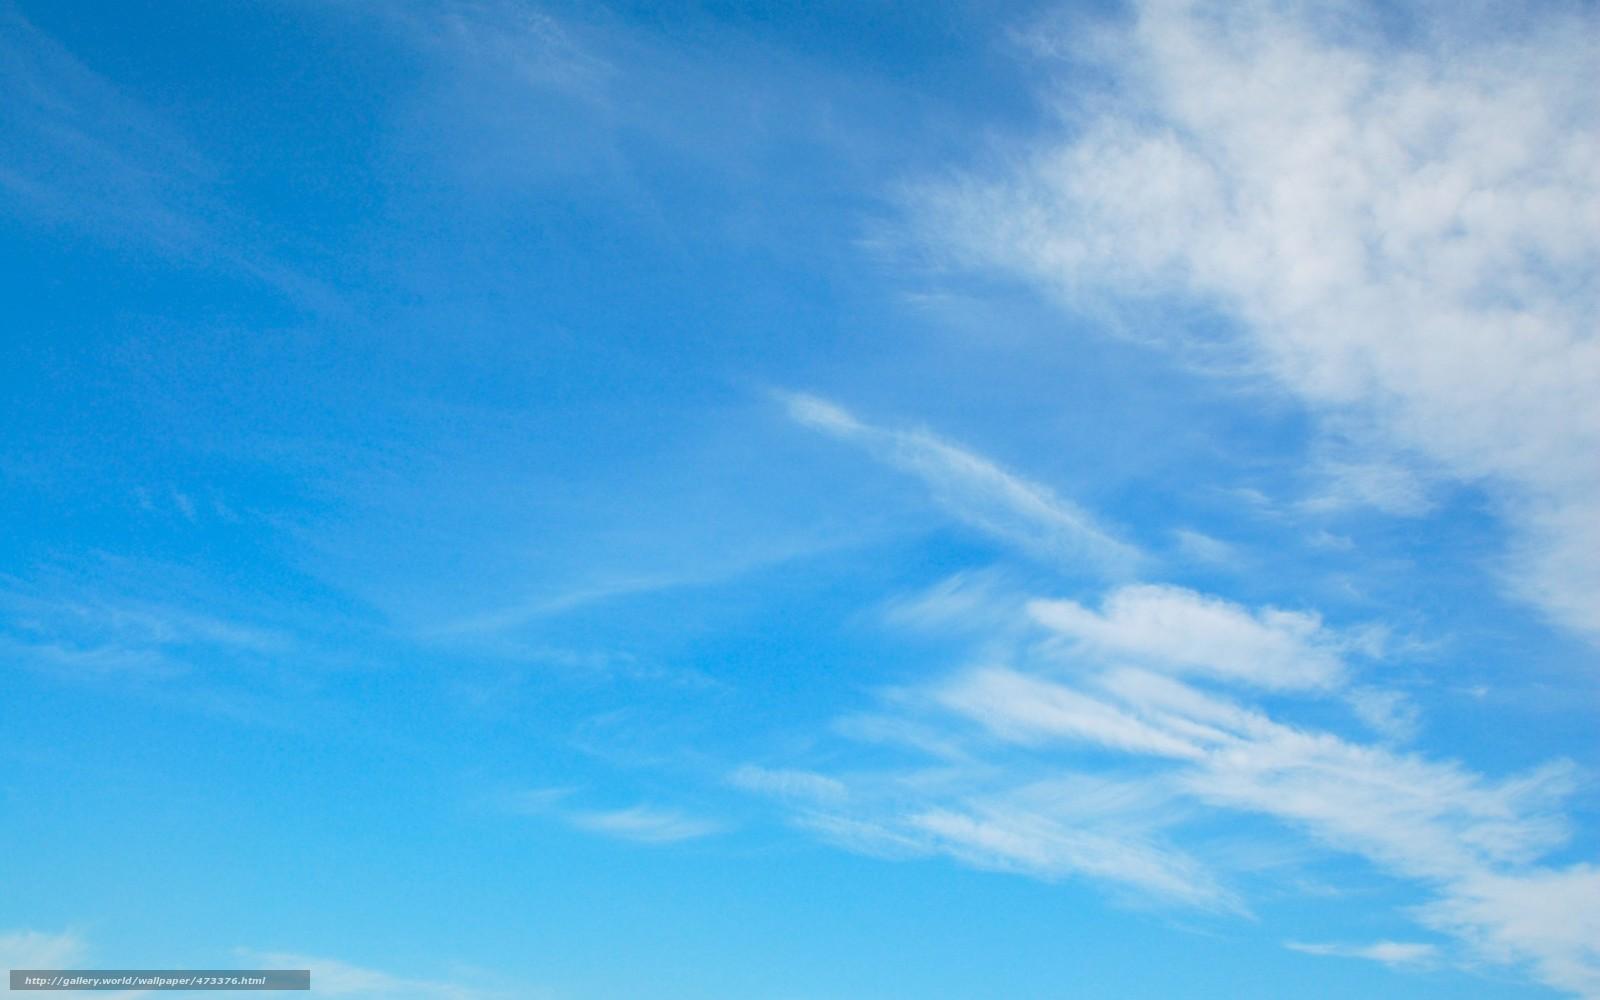 Красивое фото неба с облаками